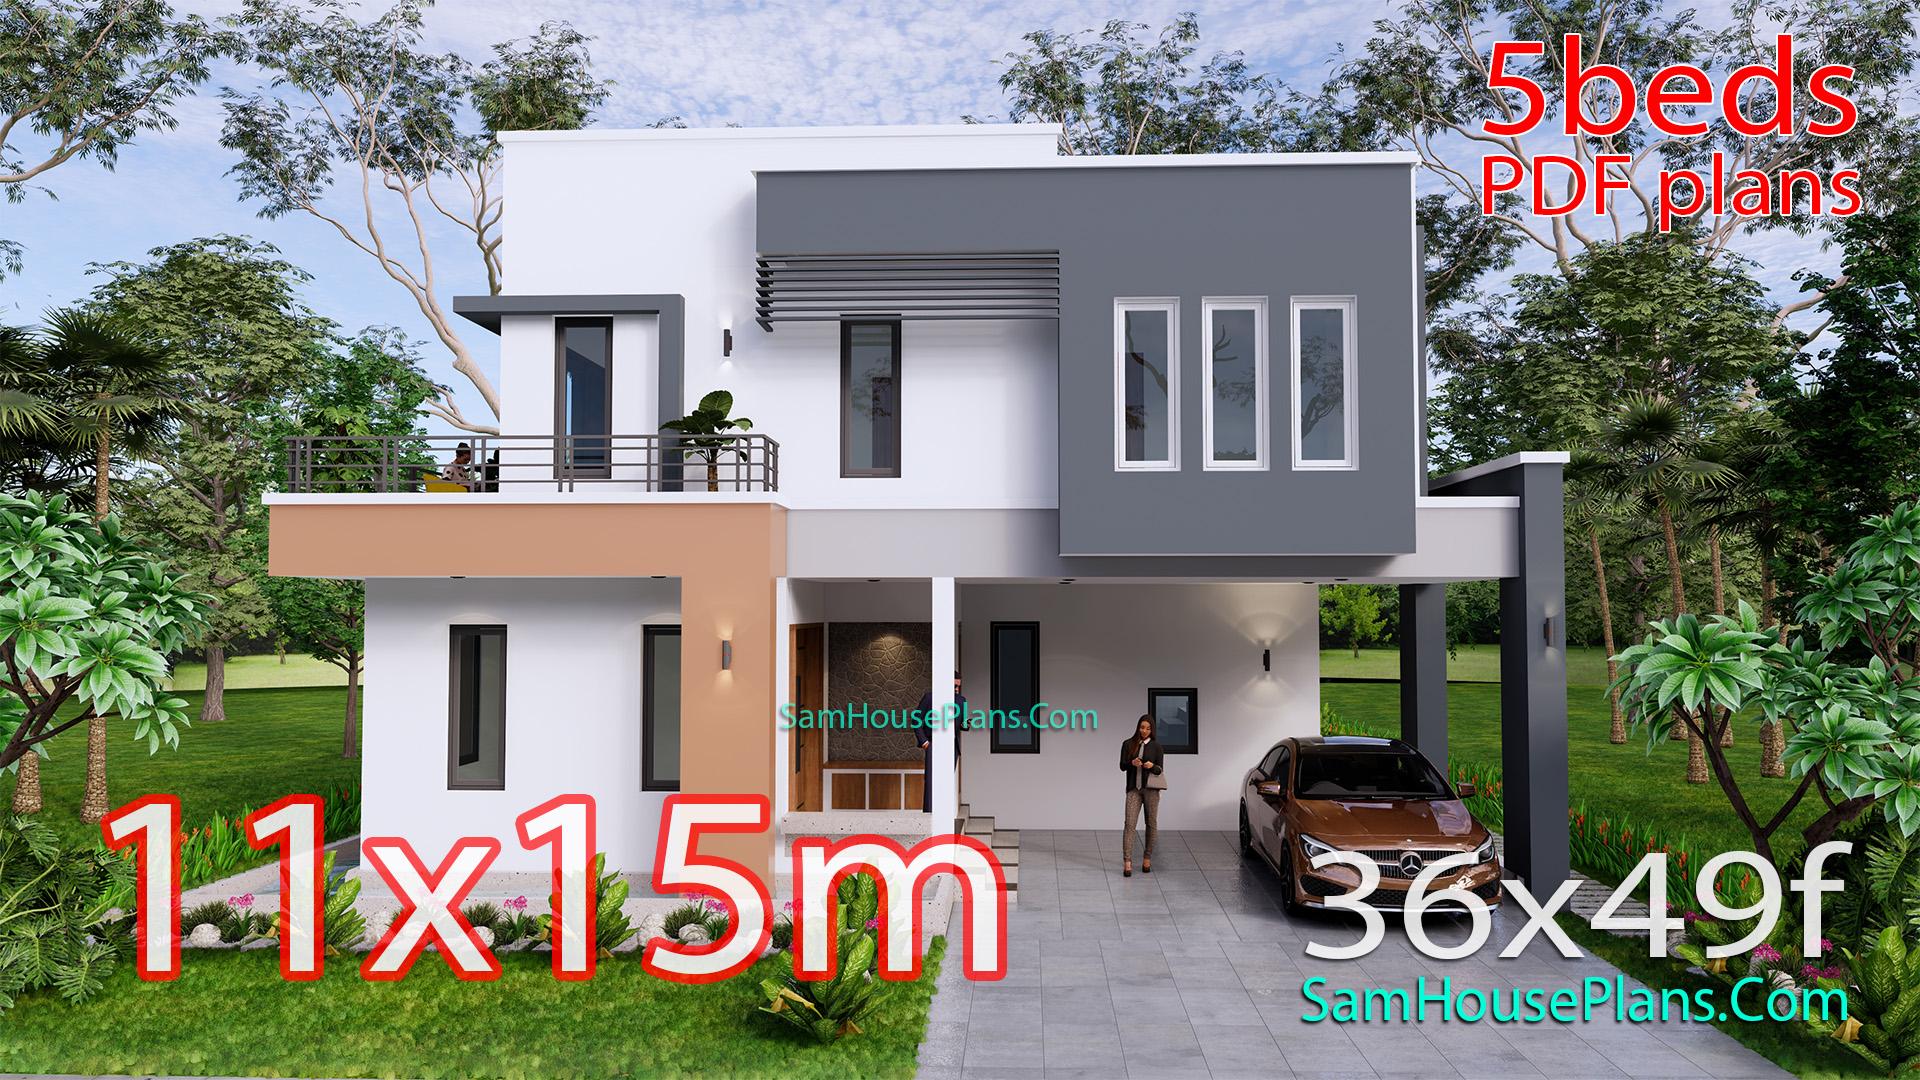 House Design Plan 11x15 Meter 5 Bedrooms 36x49 Feet Samhouseplans